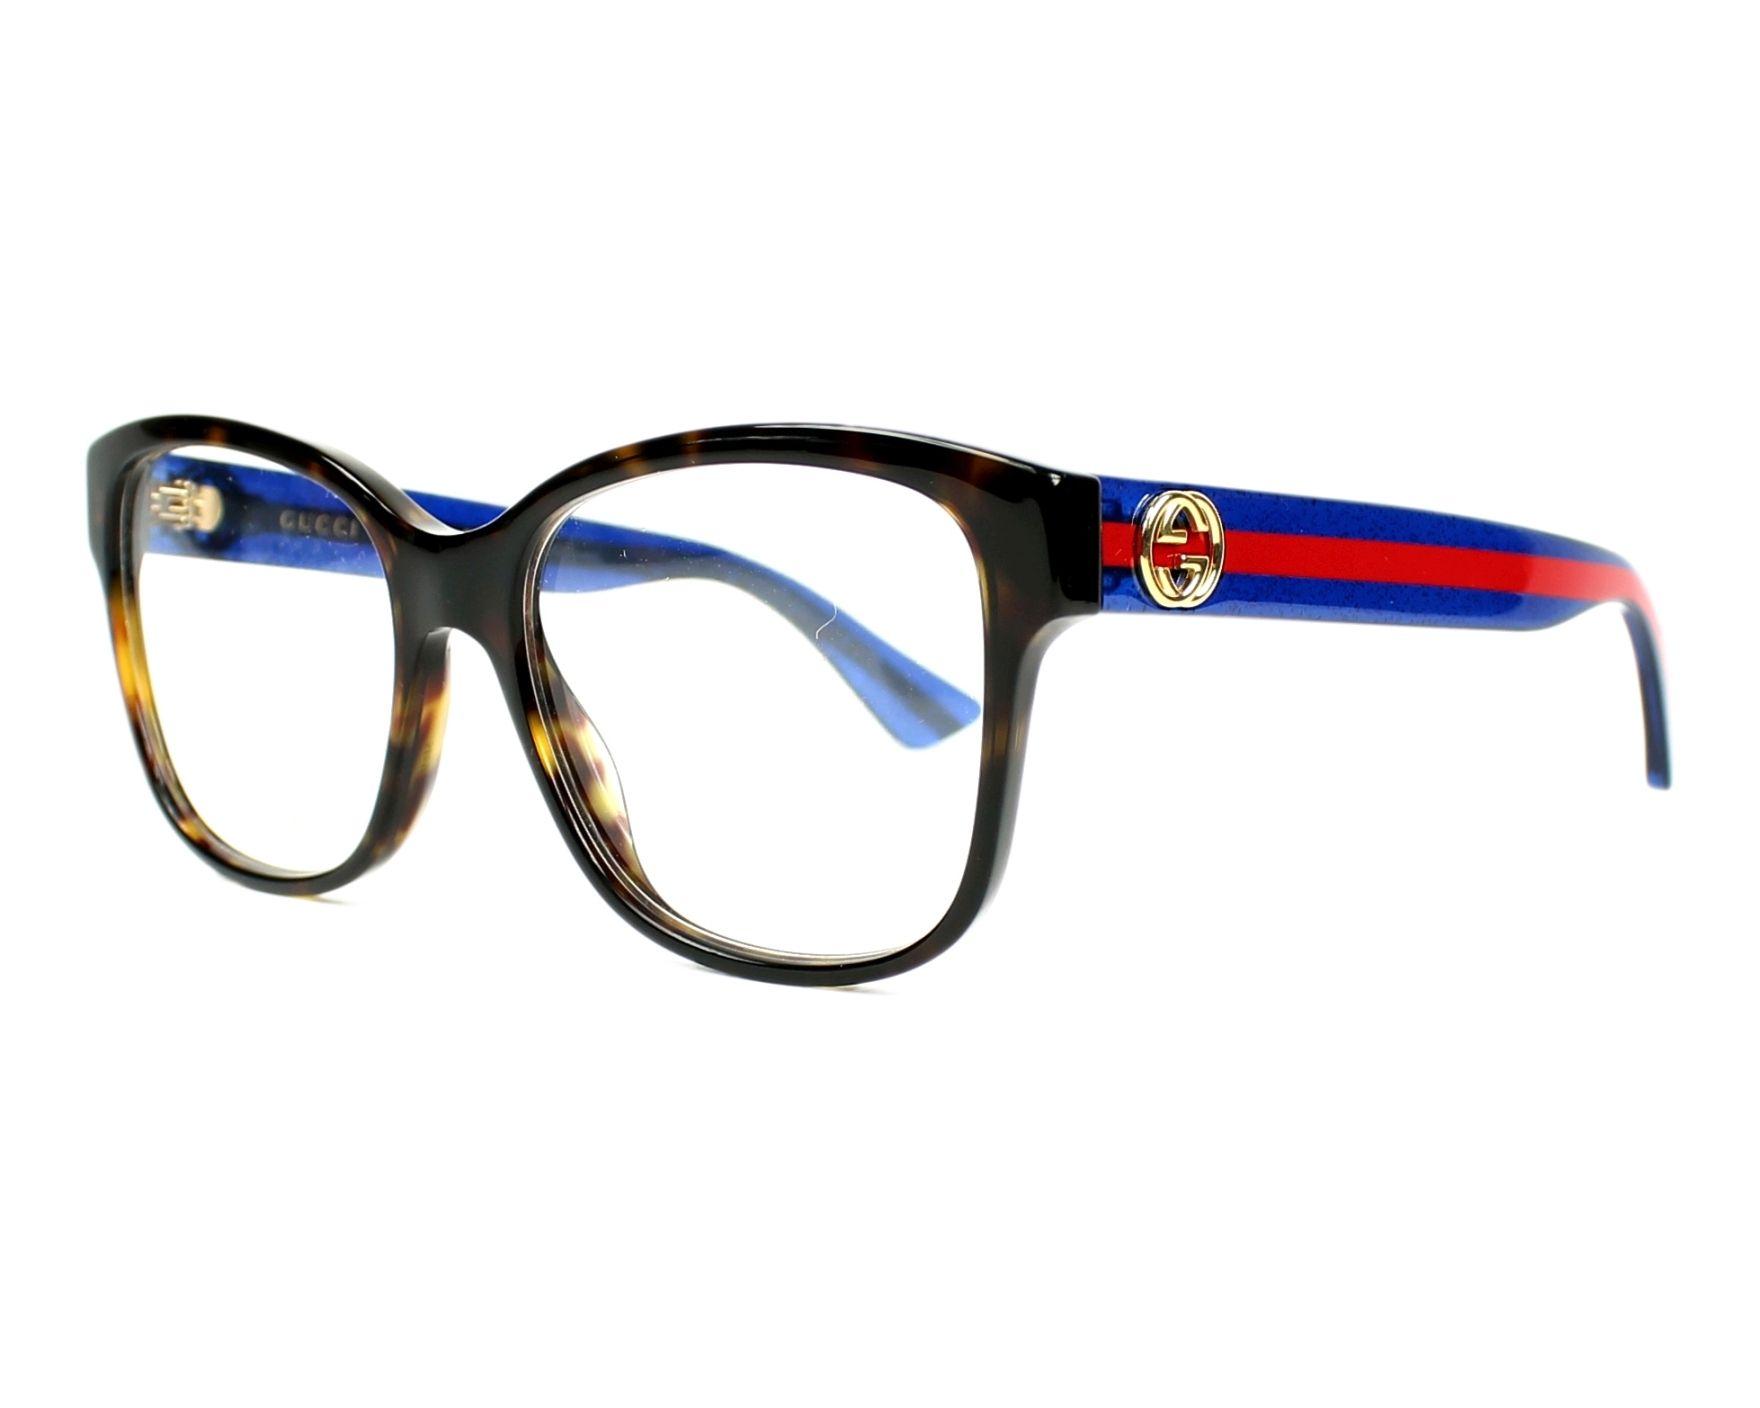 3df34be141 Gafas Graduadas Gucci GG-0038-O 003 54-17 Havana Azul vista de